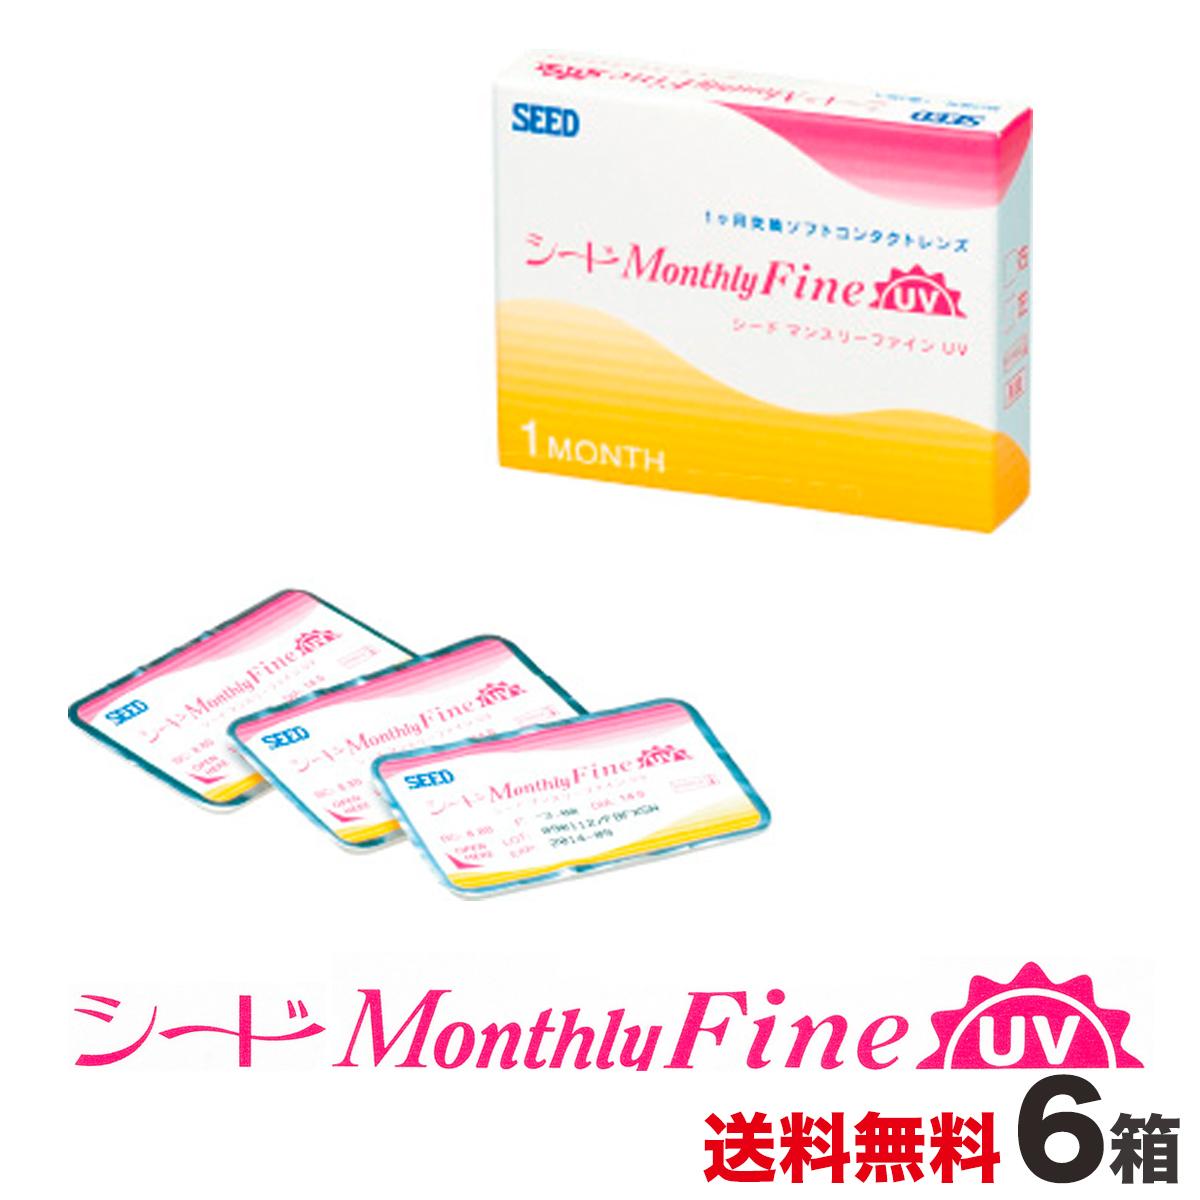 MonthlyFine UV 6箱 全国送料無料!<1ヵ月交換タイプ ソフトコンタクトレンズ シード 1箱 3枚入り マンスリーファインUV>※meruruスティック プレゼント対象商品!